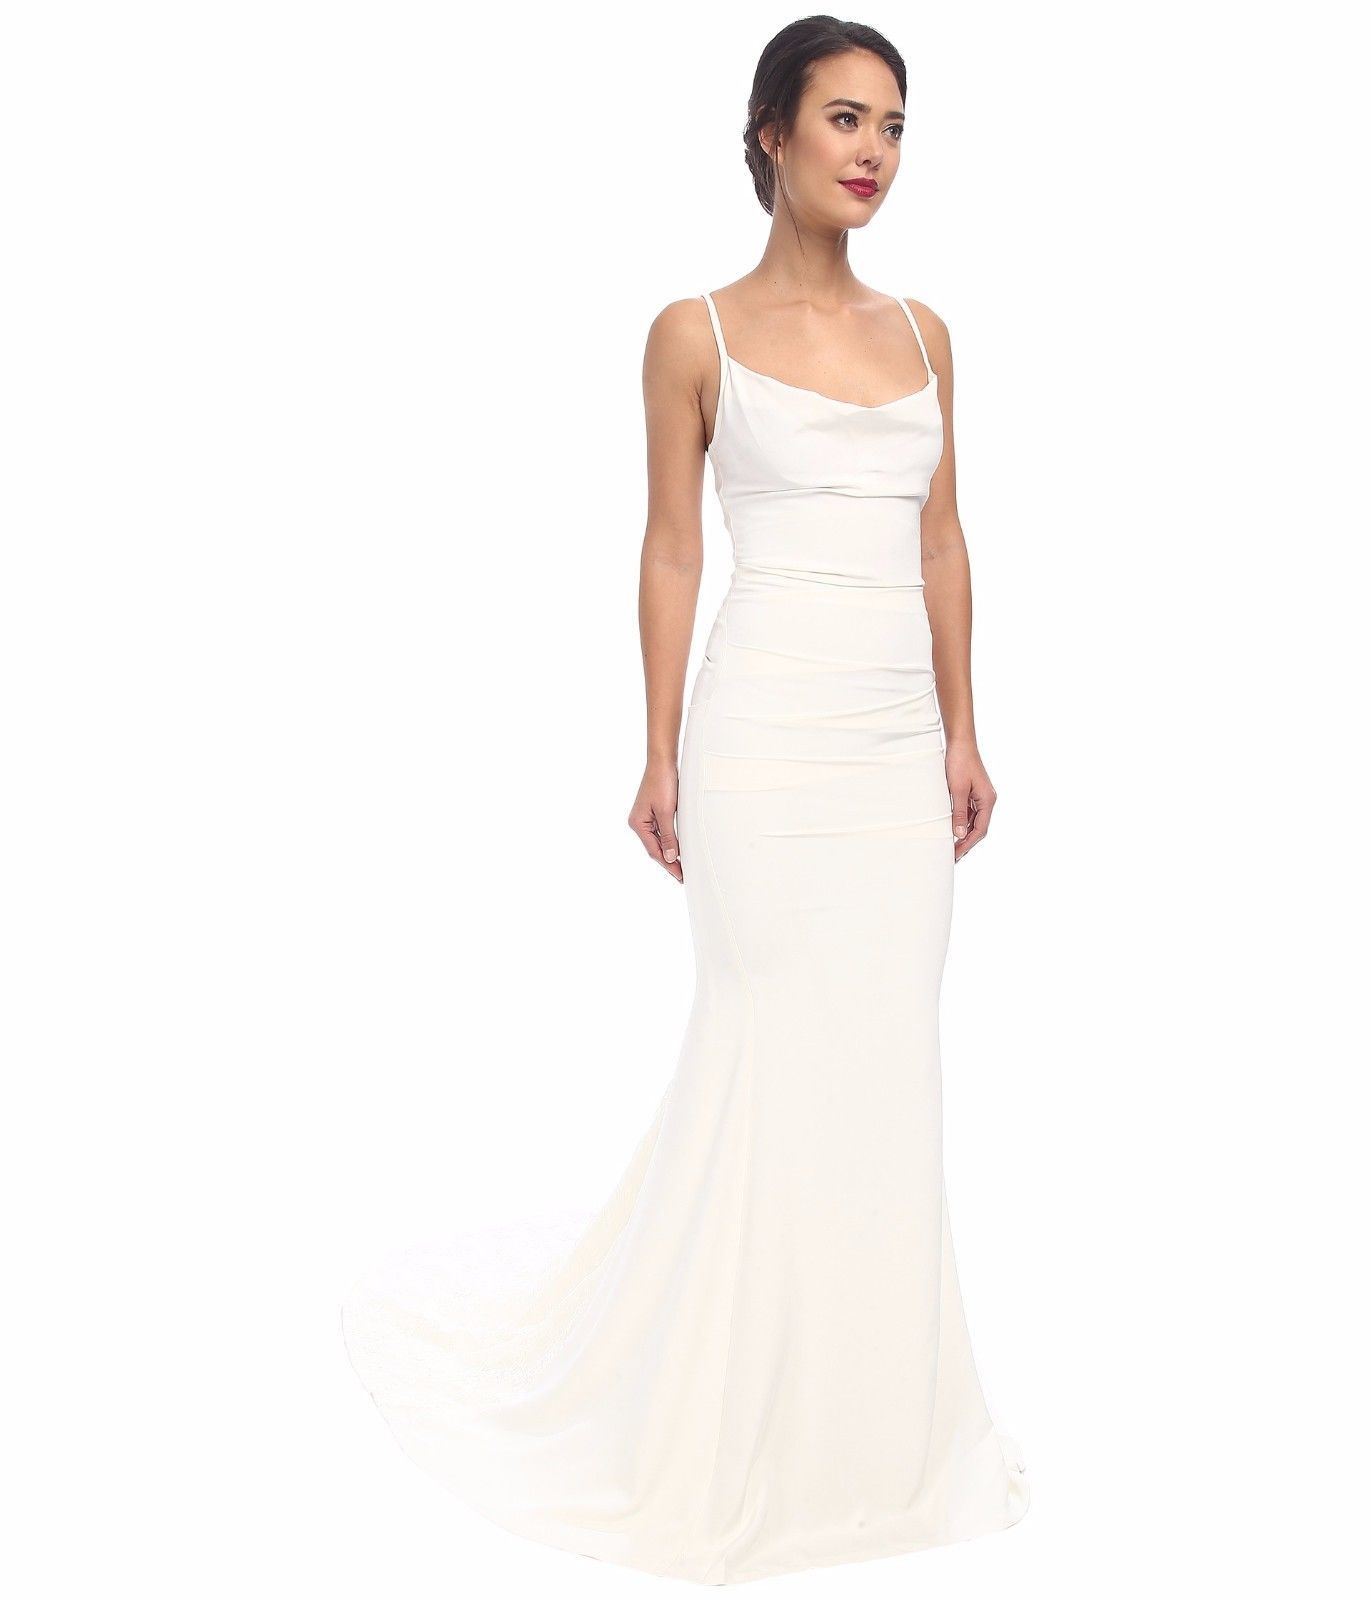 Nicole Miller Hampton Lace Back Antique White Wedding Dress Sleeveless Gown Sz 0